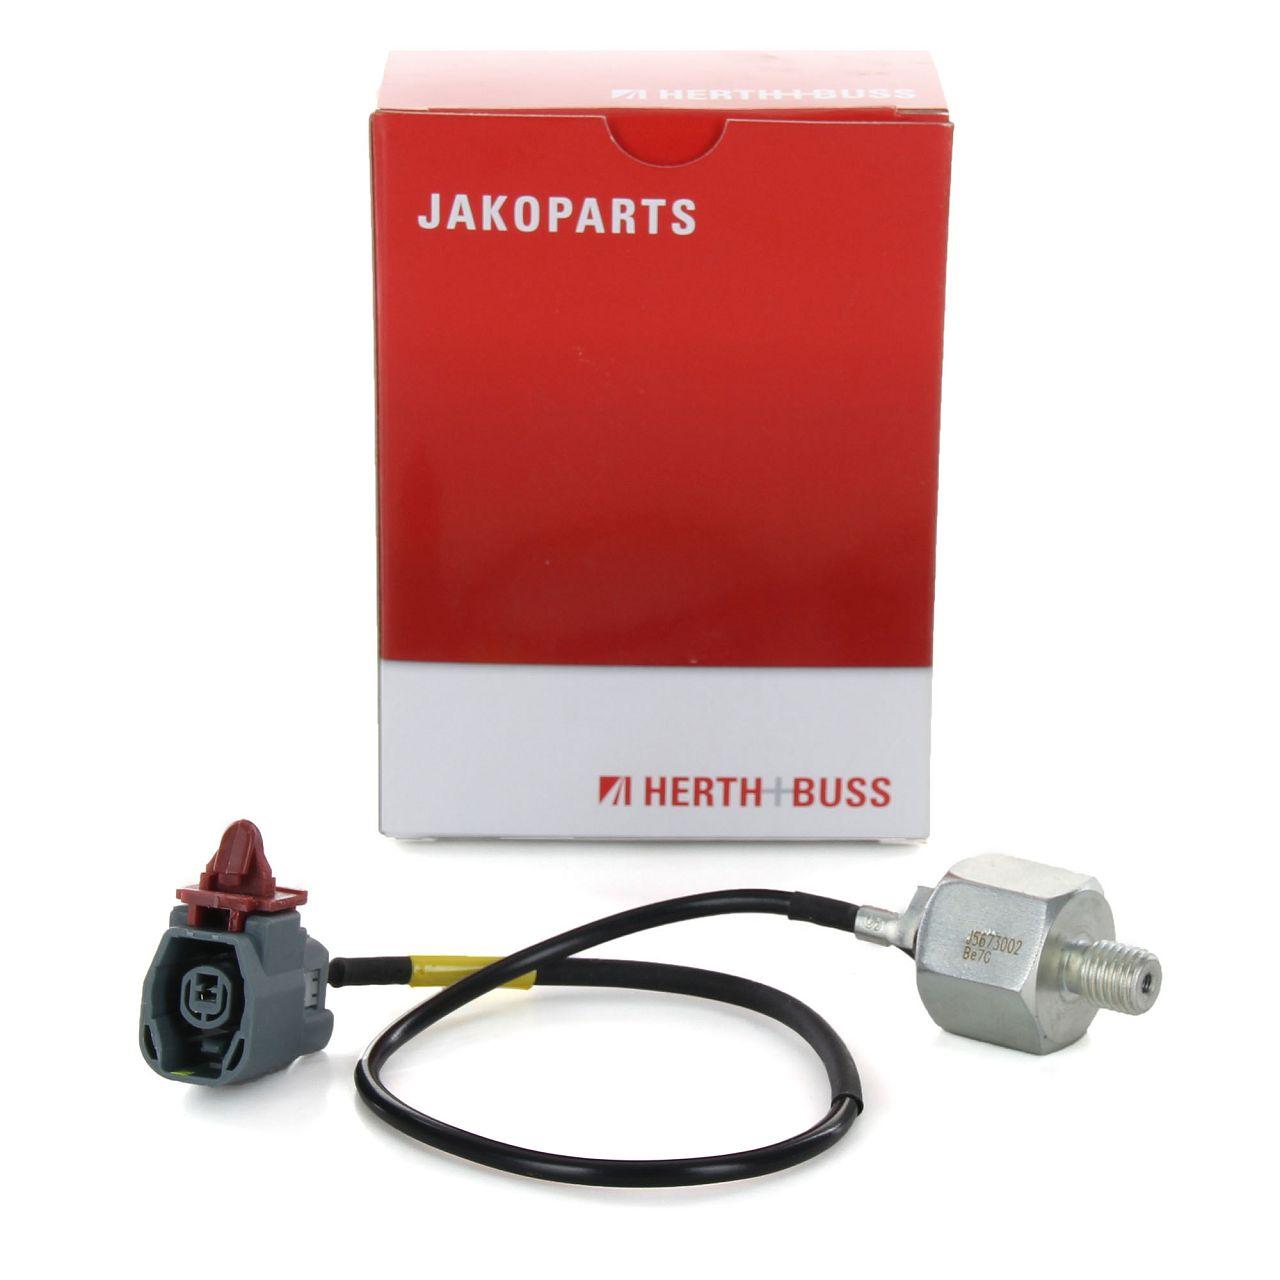 HERTH+BUSS JAKOPARTS Klopfsensor für MAZDA 323 F/S VI 626 V MPV II PREMACY